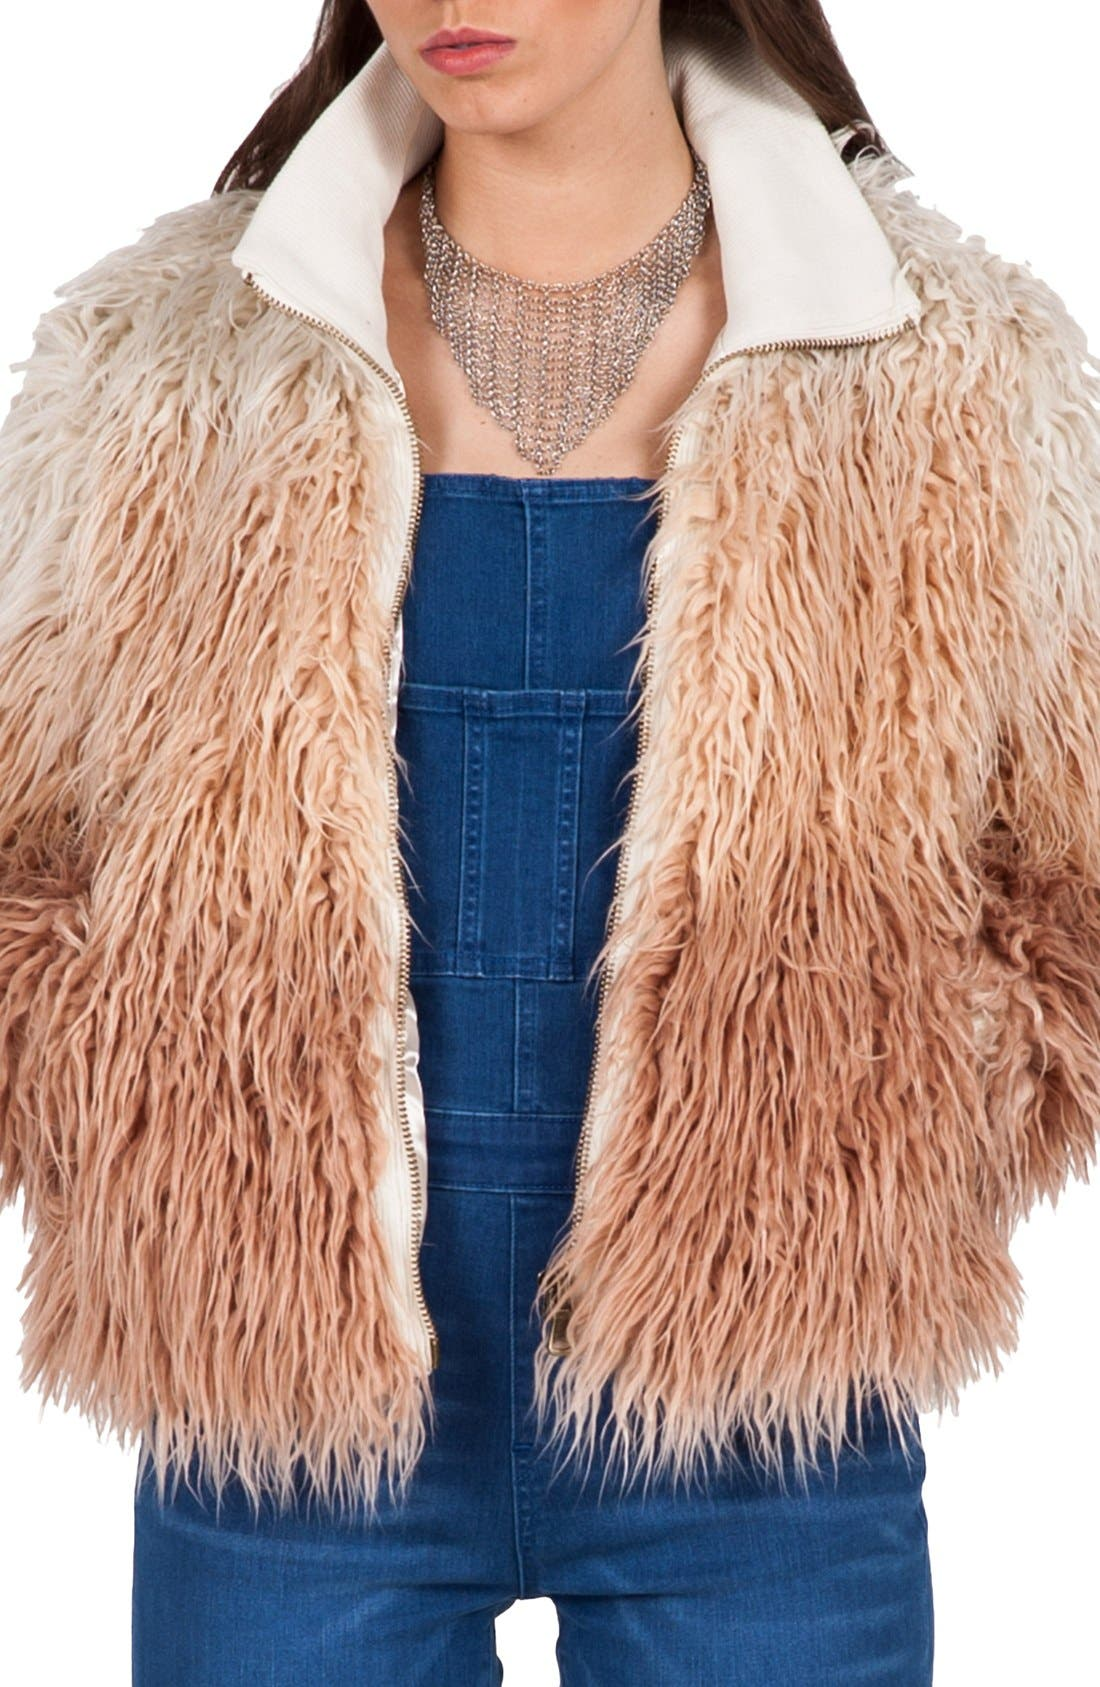 Main Image - Volcom 'Furrankie' Faux Fur Jacket